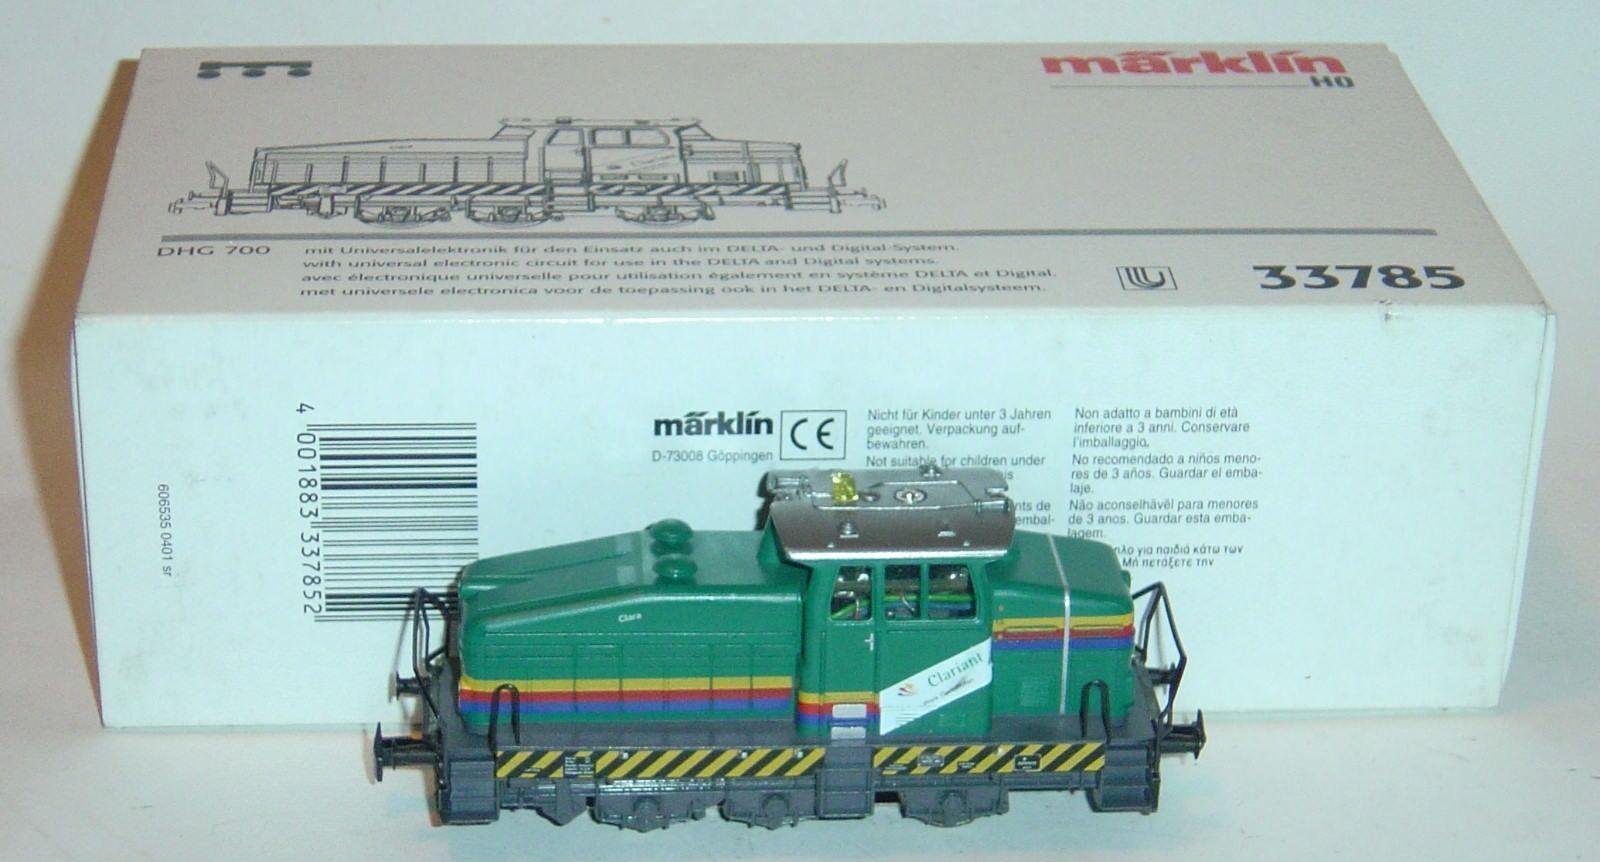 Marklin ho, diesel locomotive DHG 700 clariant ref.33785 Delta digital